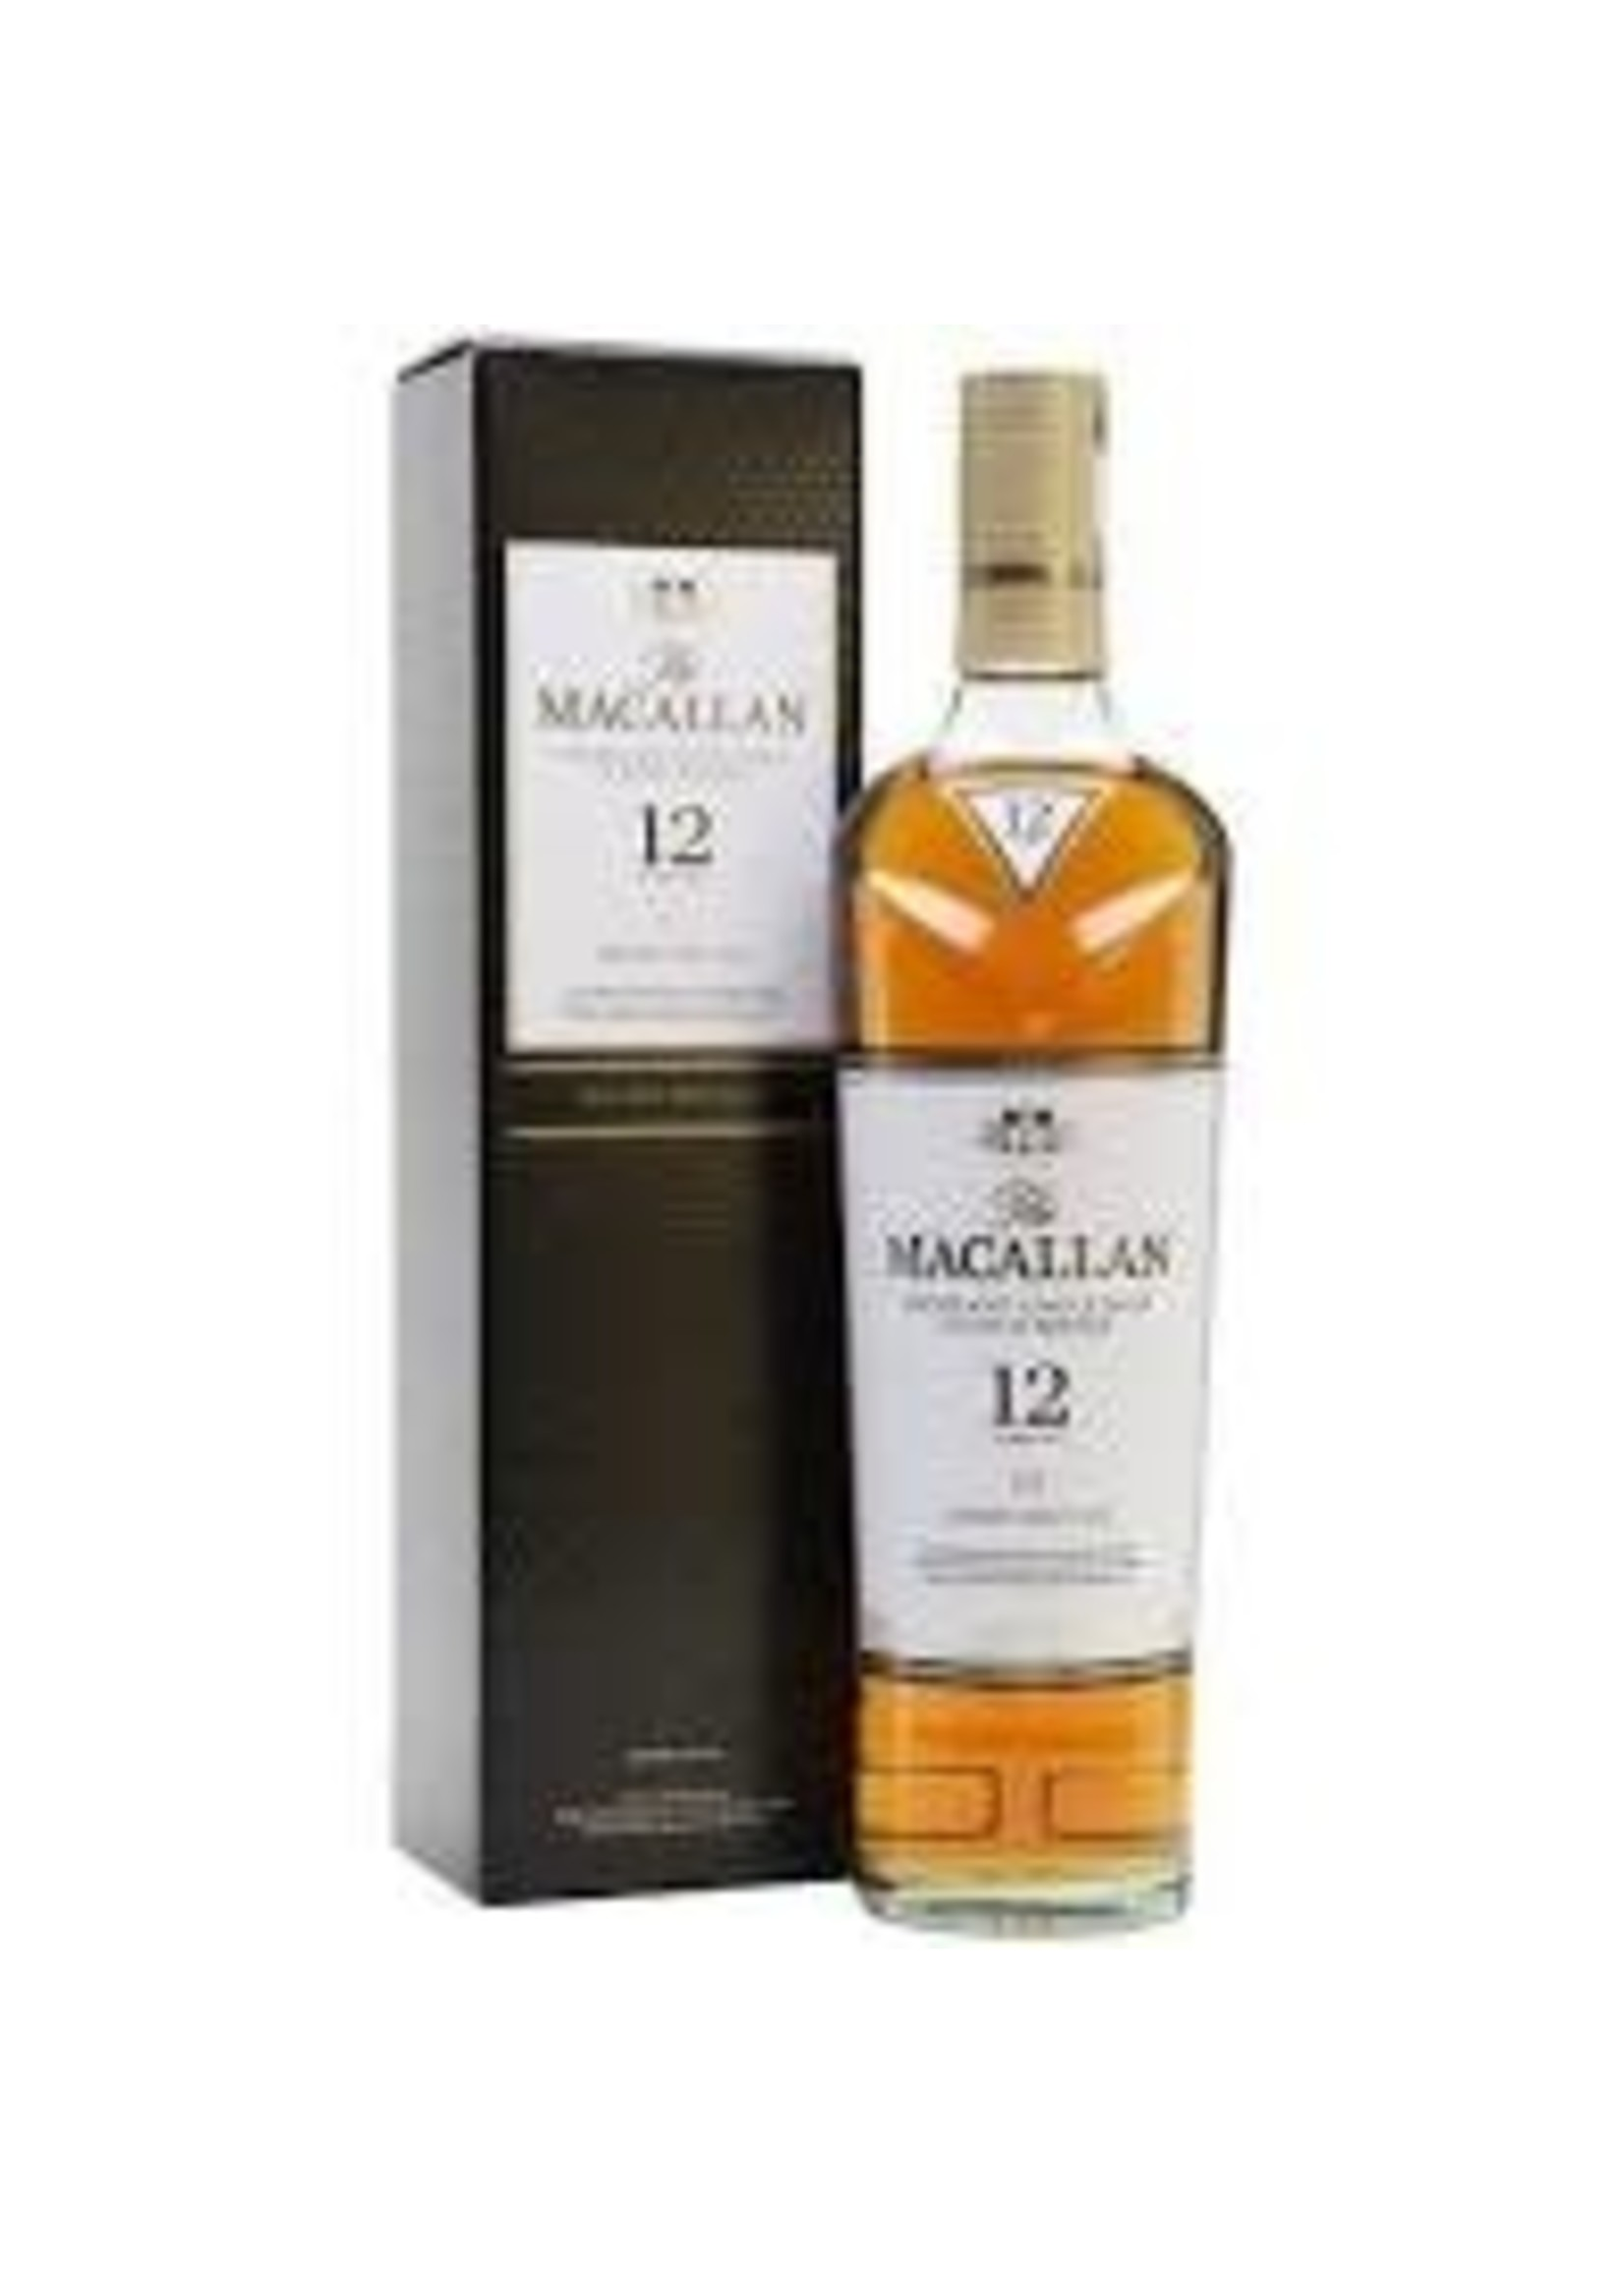 The Macallan Scotch 12 Year Sherry Oak Cask 750ml